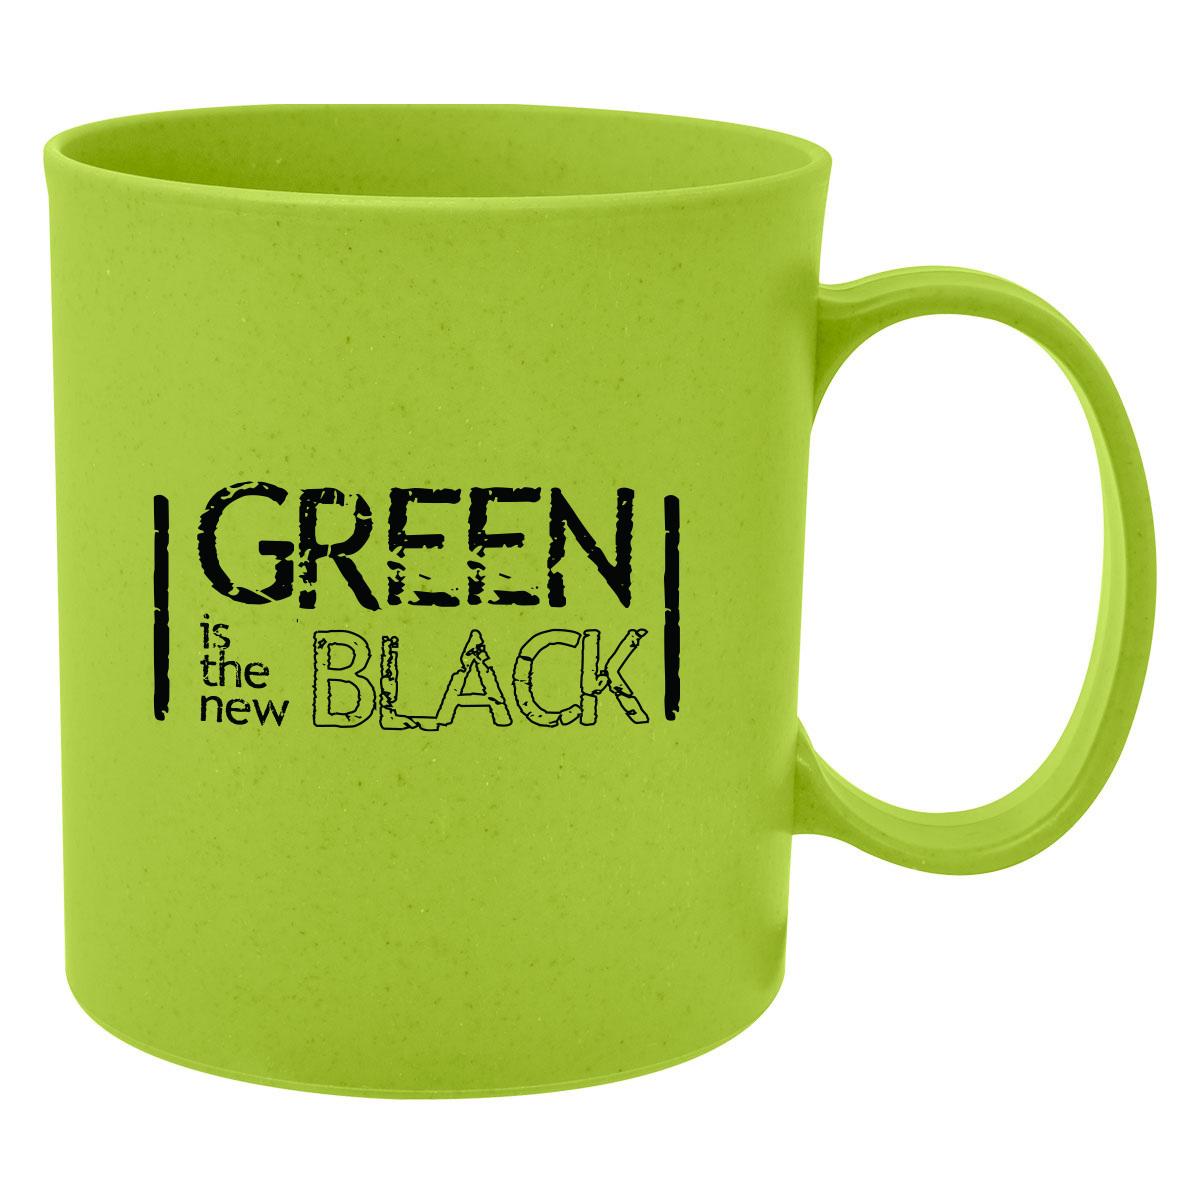 mug made of wheat straw